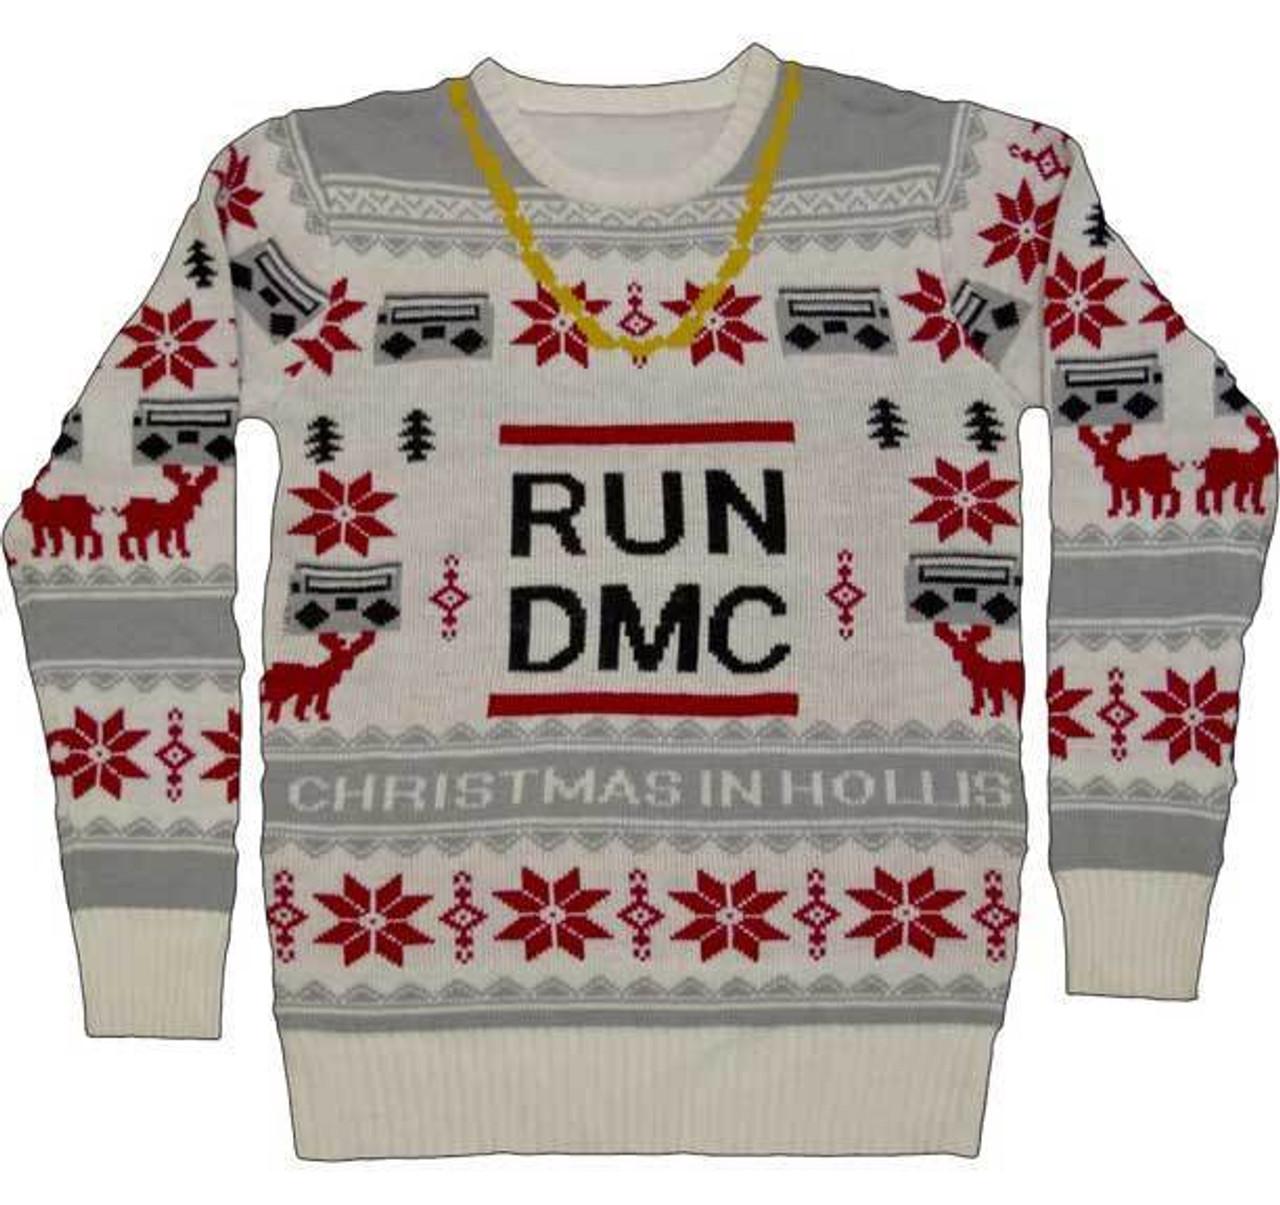 Run Dmc Christmas.Run Dmc Gold Chain Holiday Xmas Adult Mens Ugly Christmas Sweater 35191282